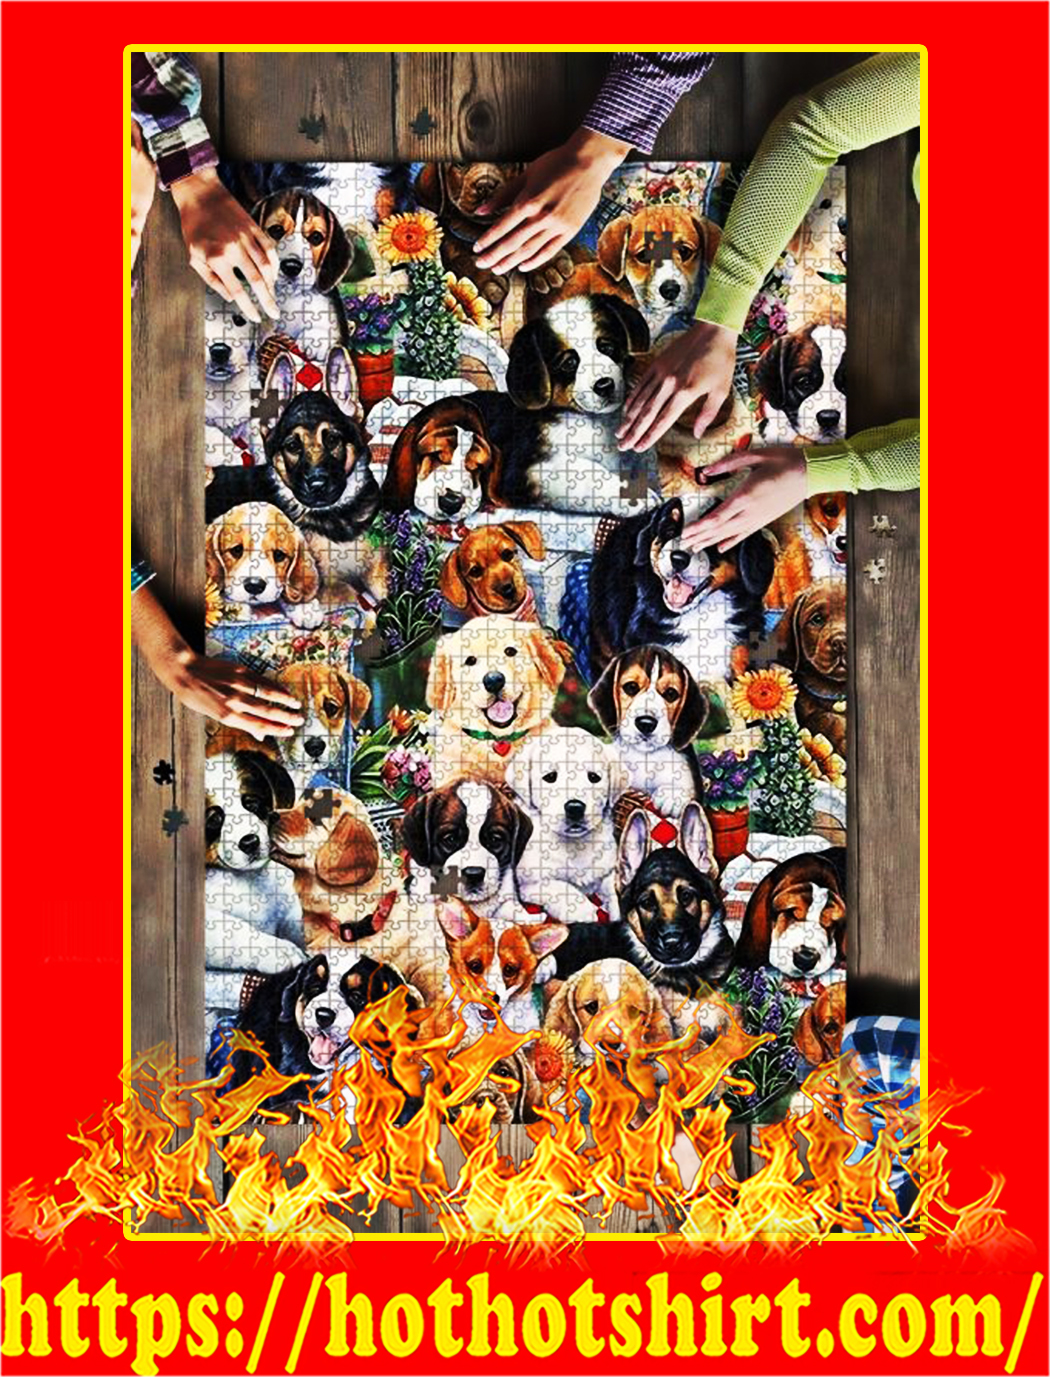 Dog Breeds Garden Jigsaw Puzzle - 1000 pieces